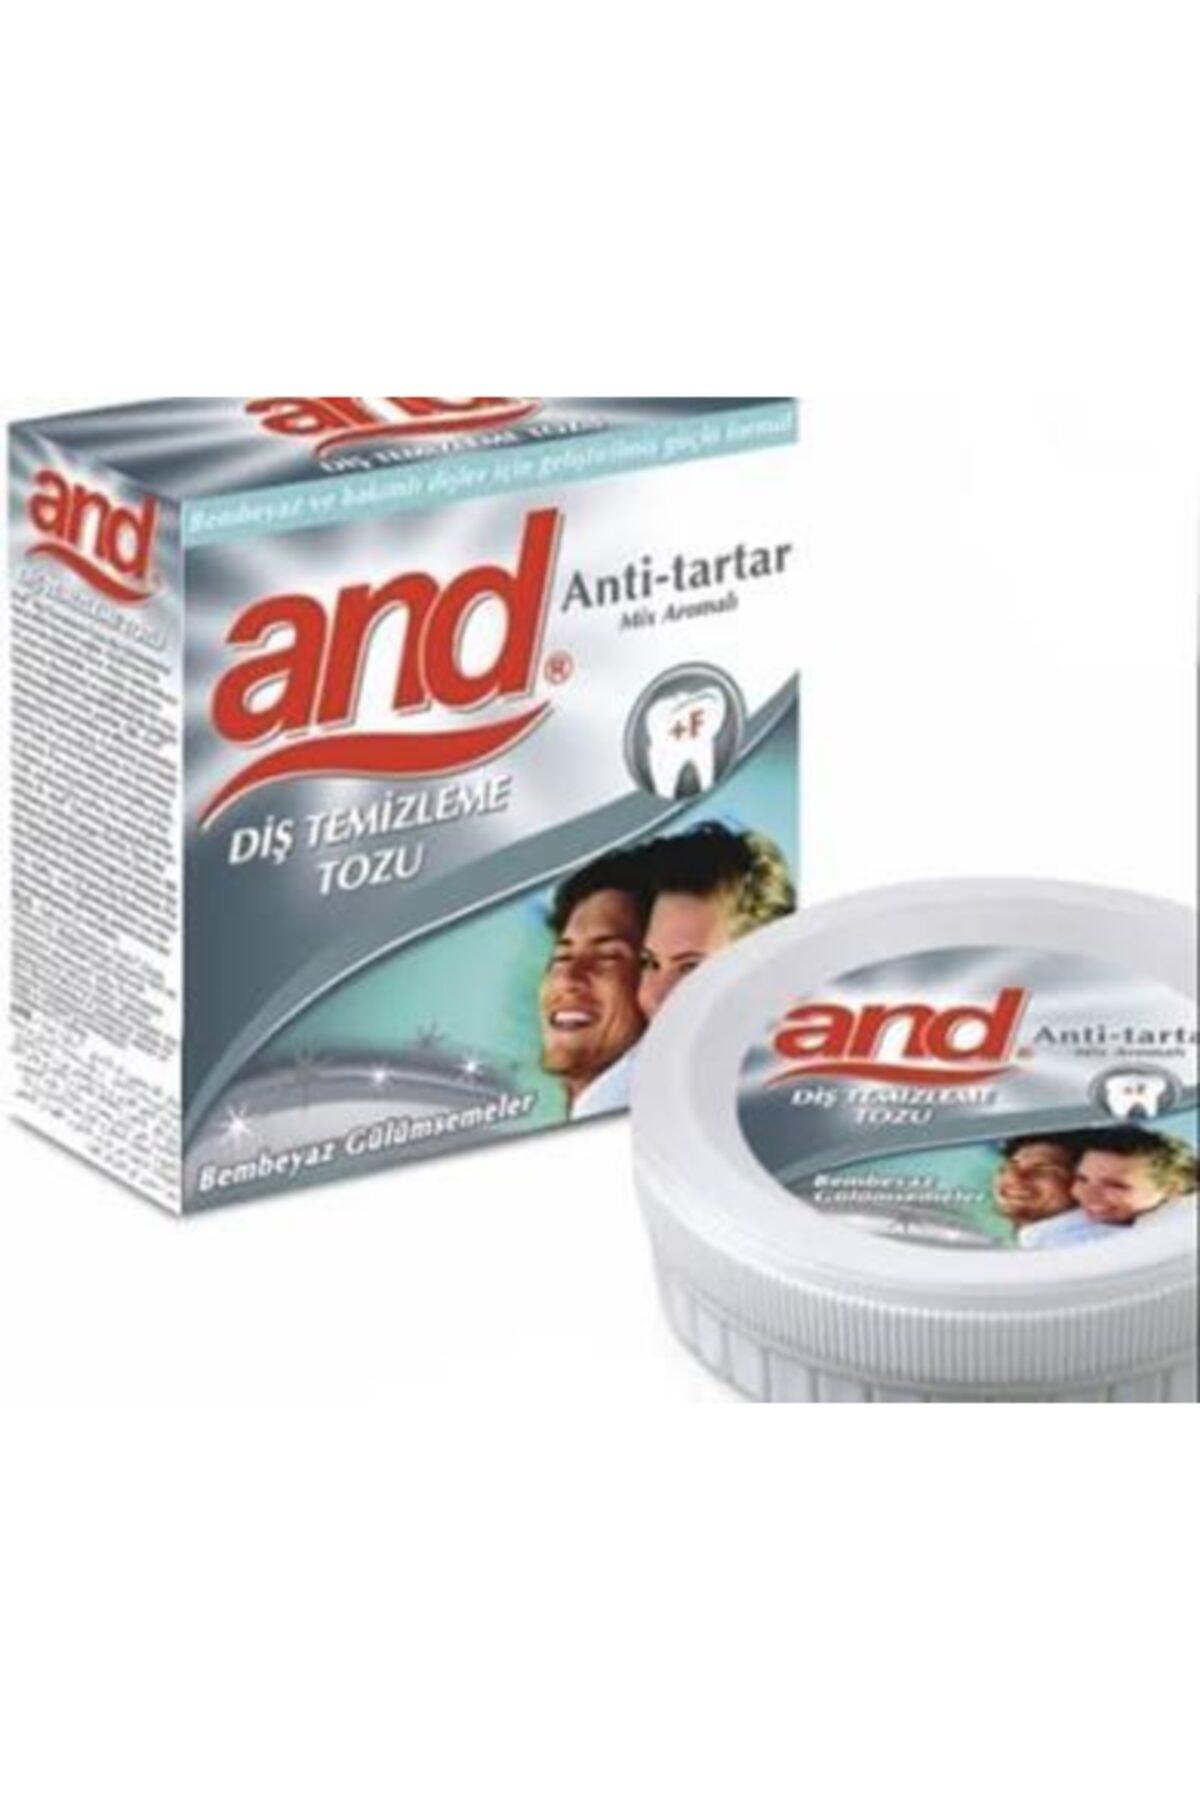 Oral-B And Dıs Tozu Antı-tartar 40gr 1